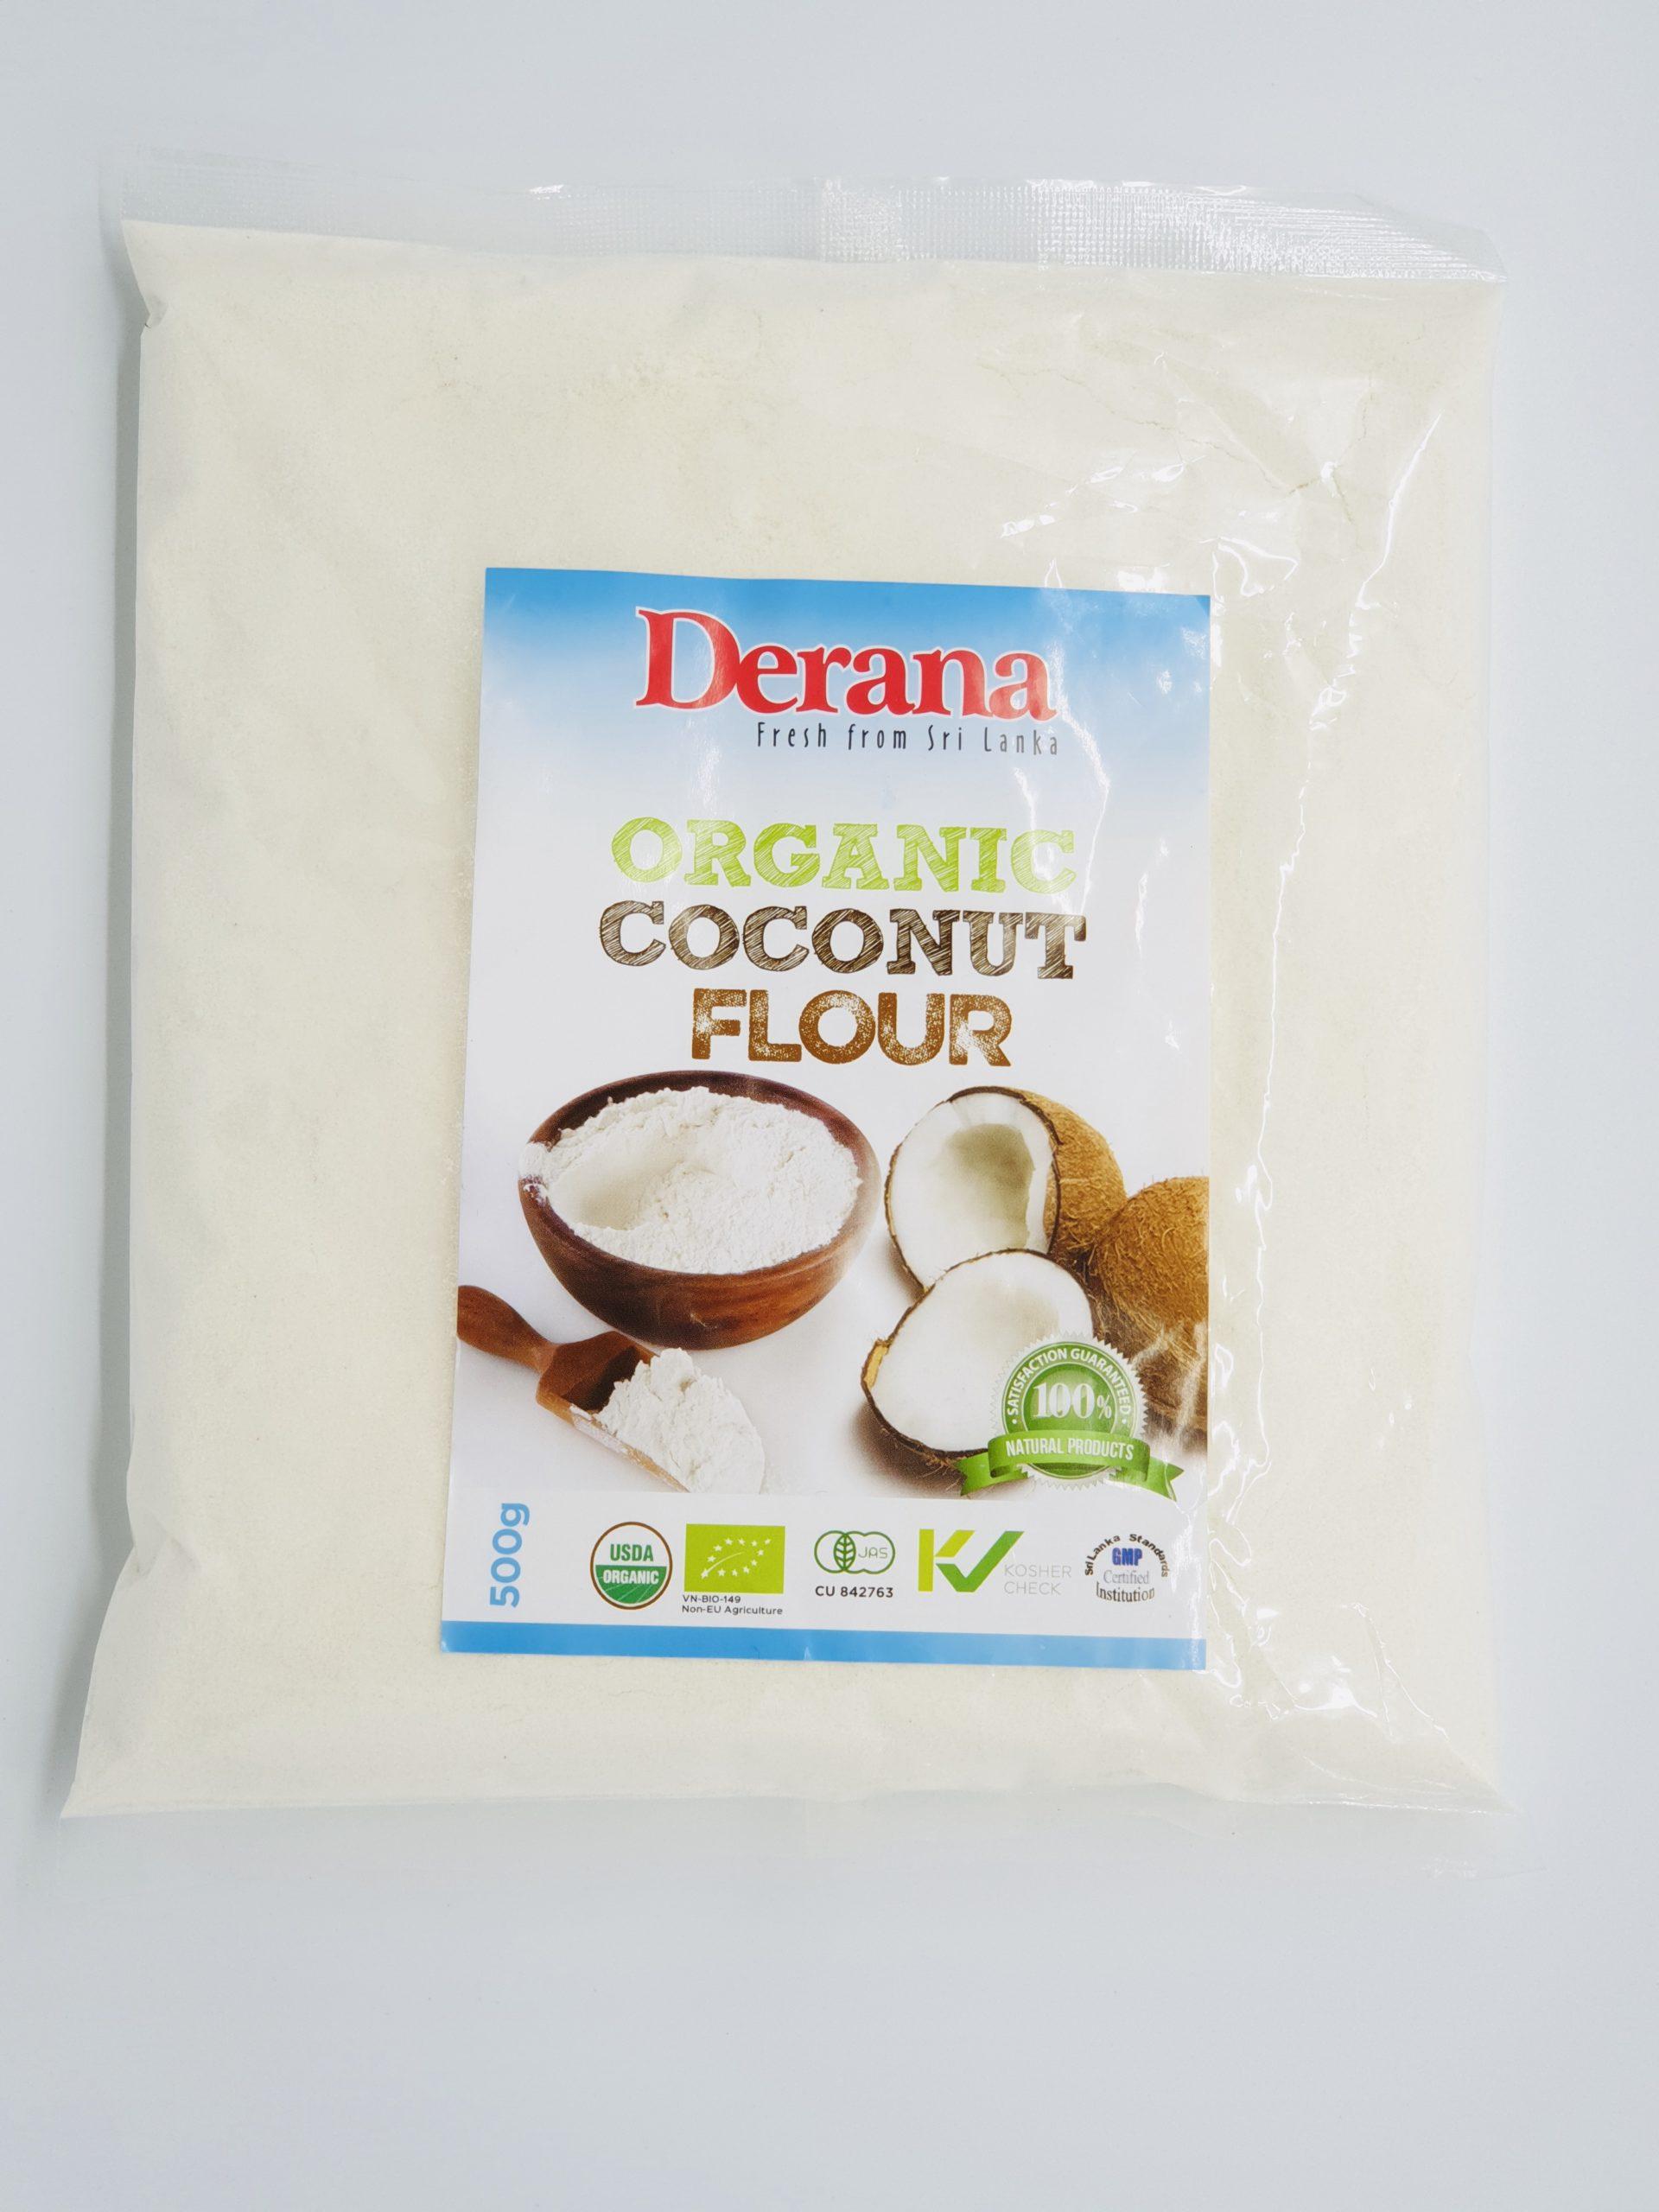 Derana Organic Coconut Flour Pride Of Punjab